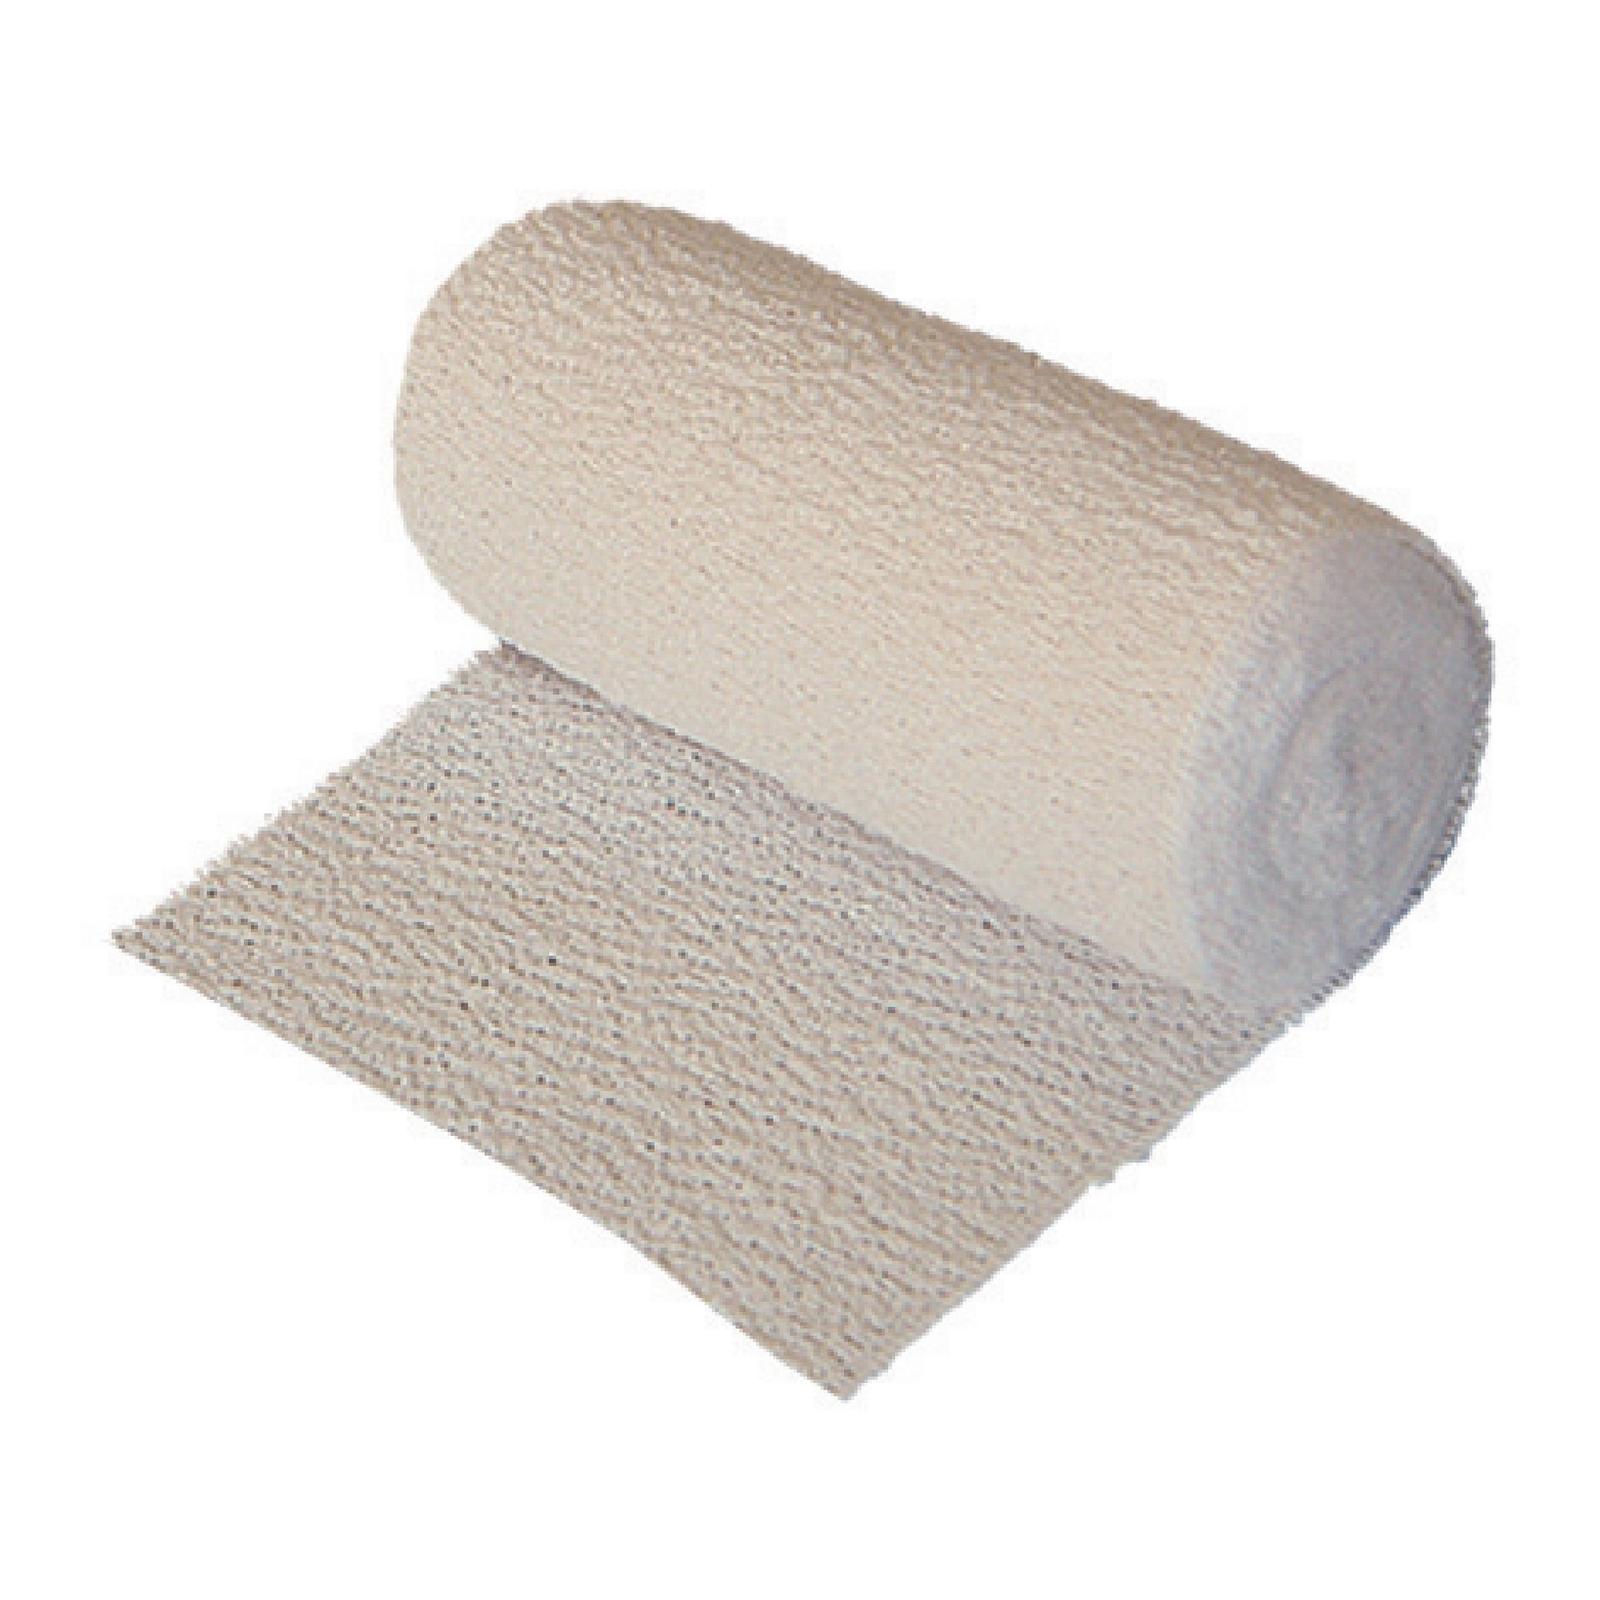 Crêpe Bandage - 50mm x 4.5m - Pack 10